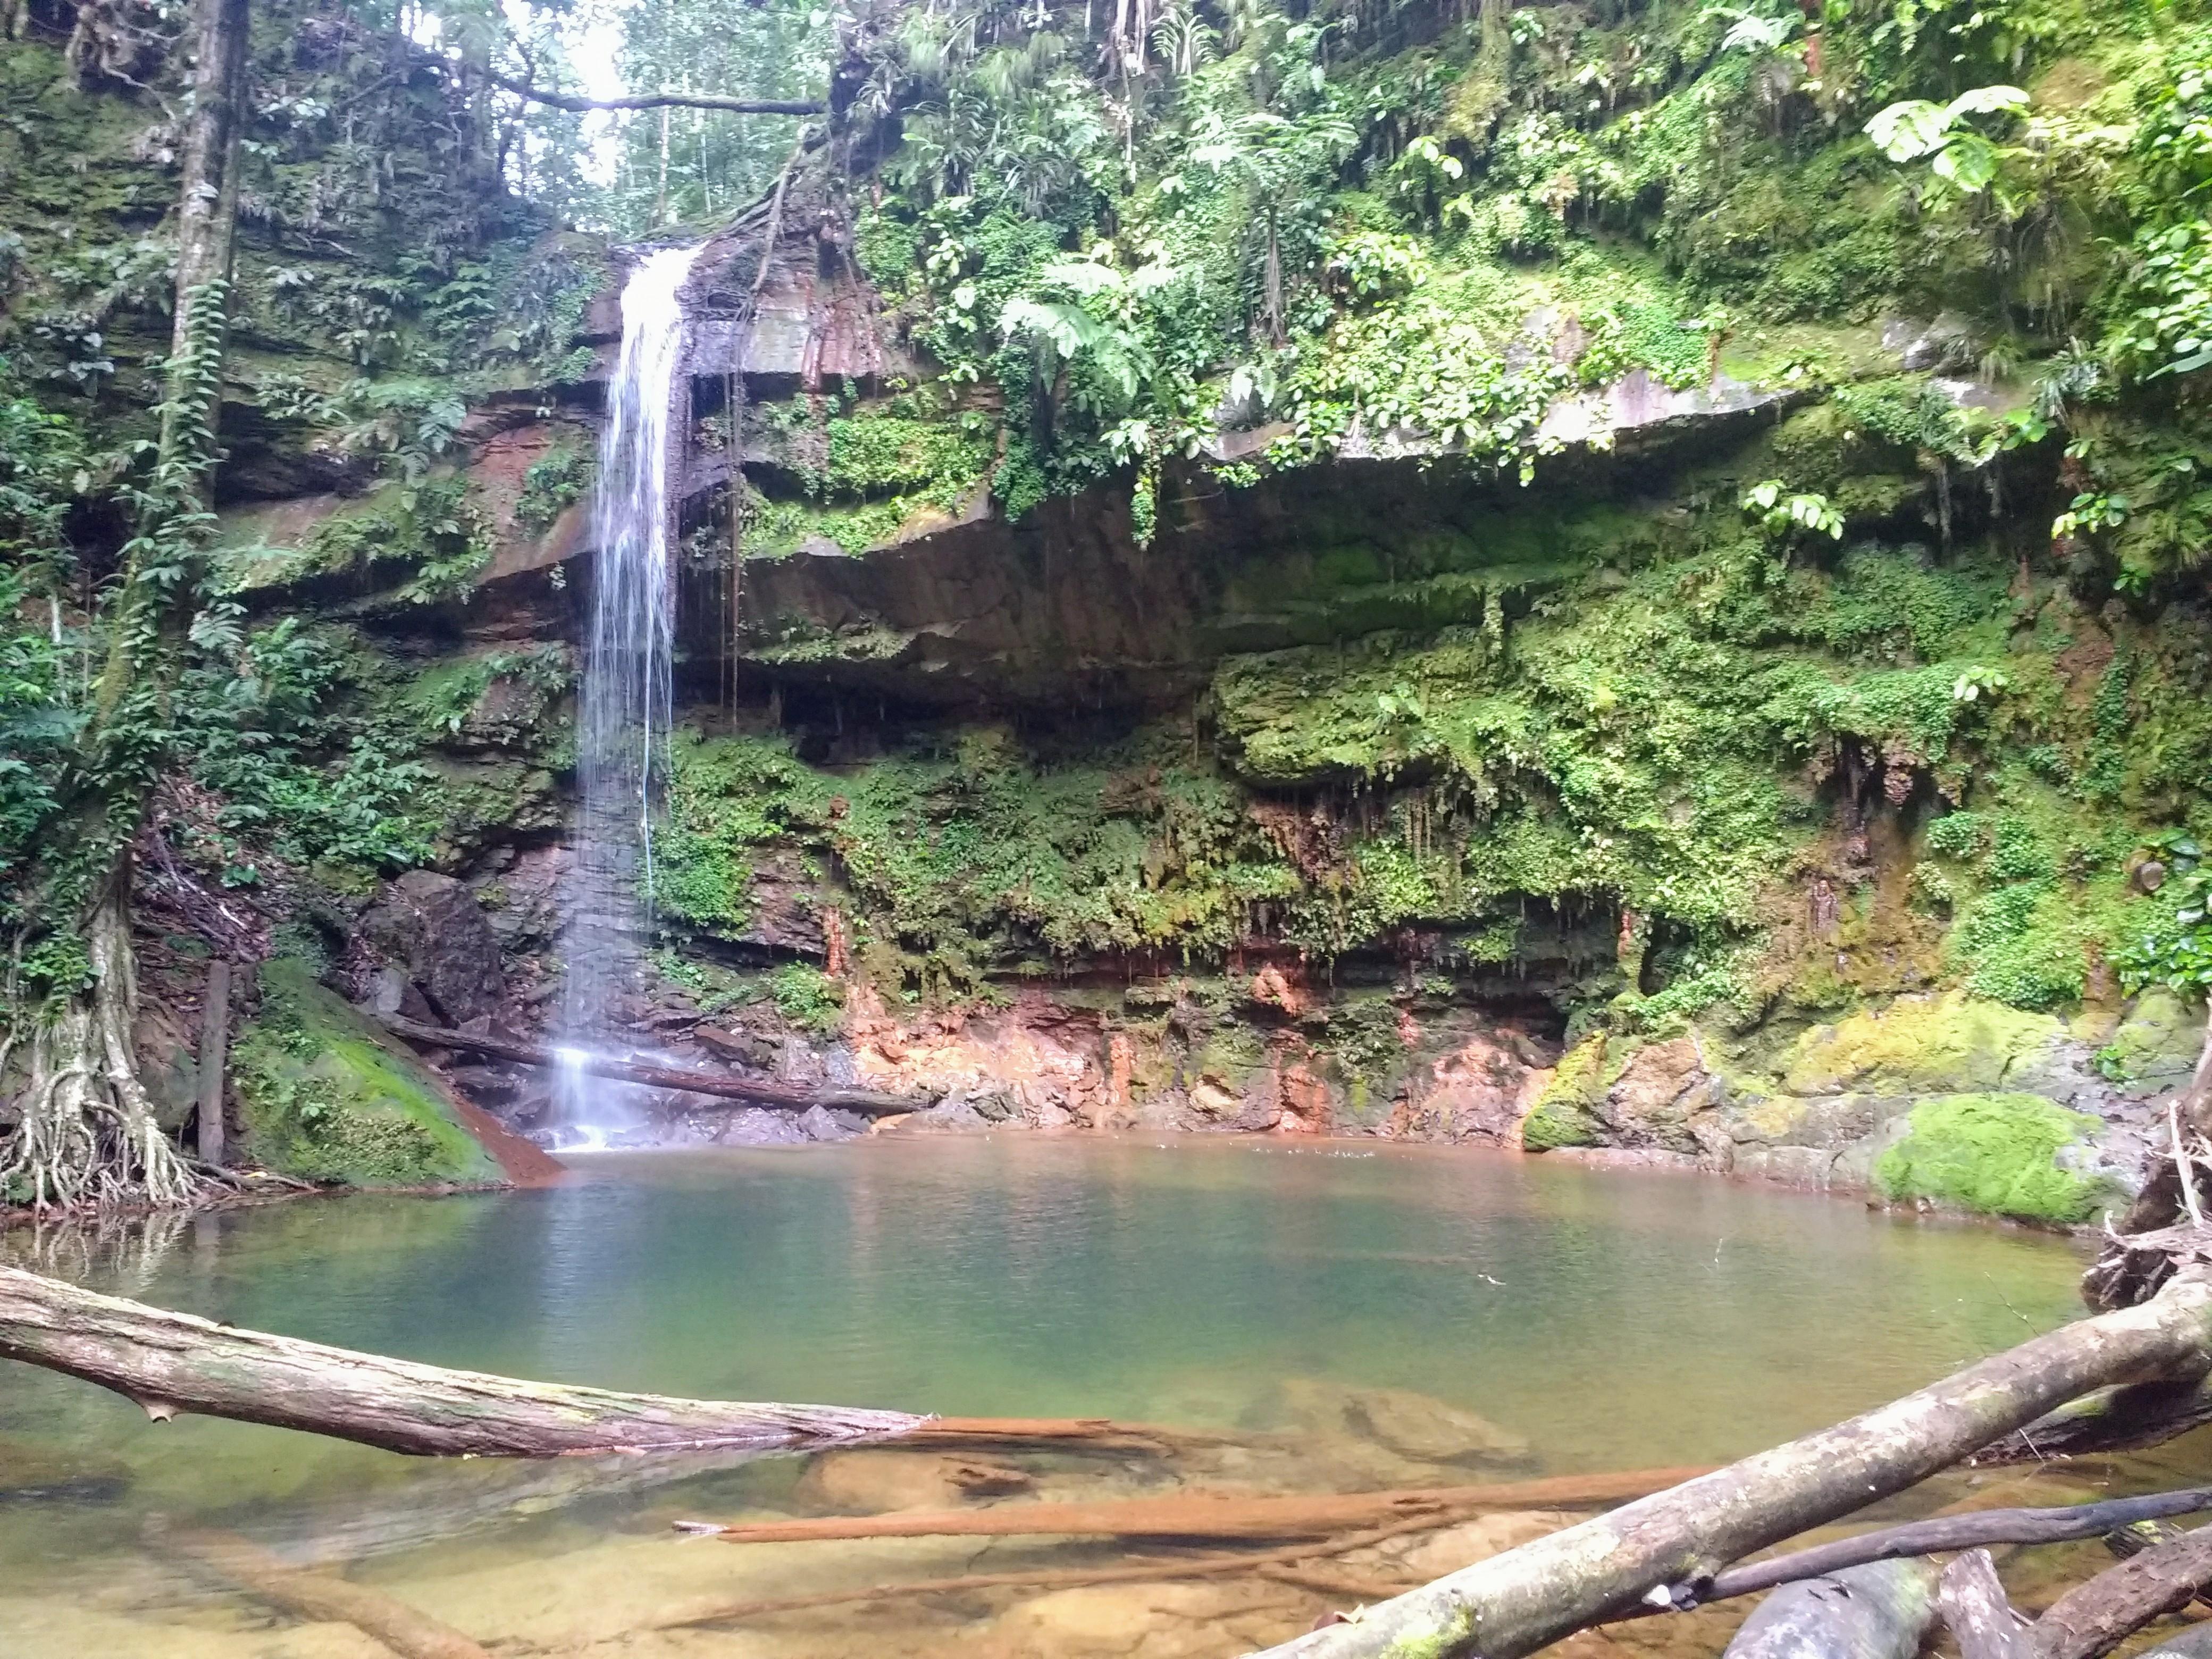 File:Lambir Hills National Park - Pantu Waterfall.jpg - Wikimedia Commons